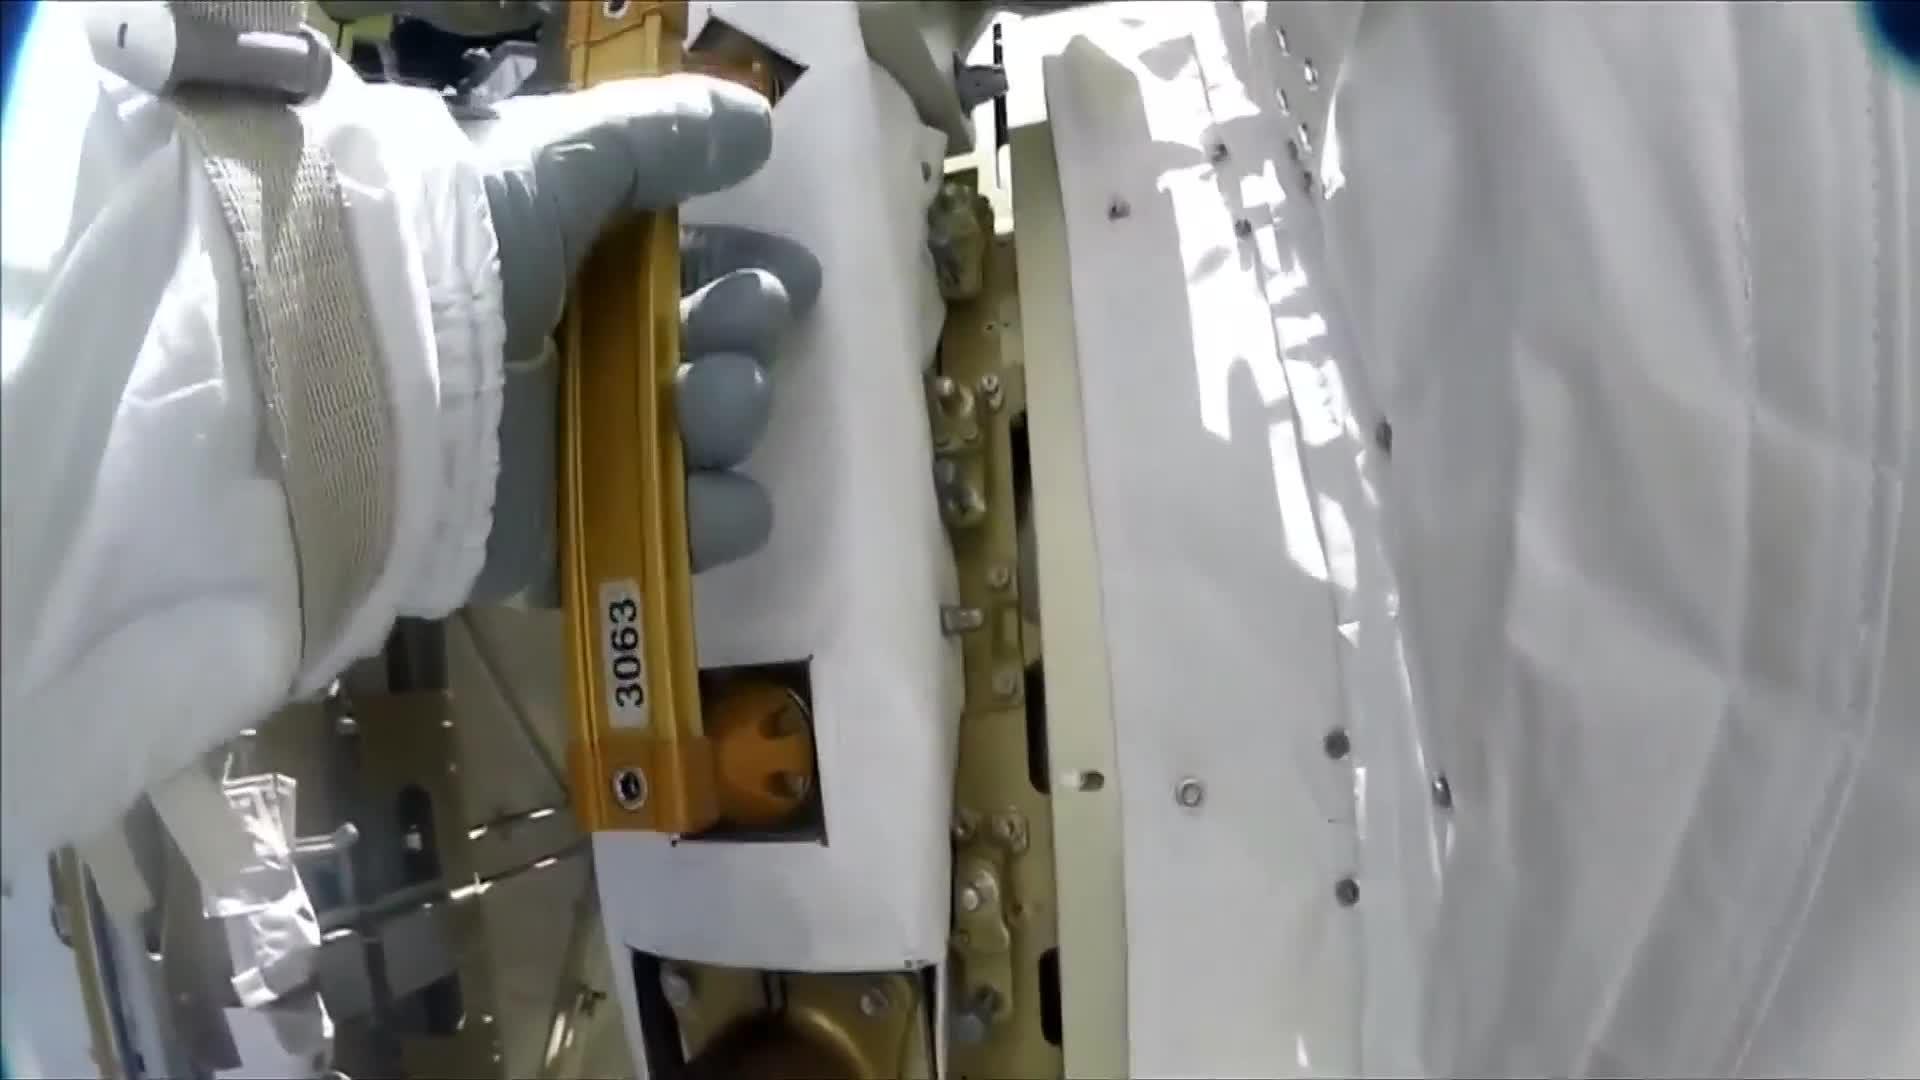 Astronaut takes 'talking' NASA camera on space walk